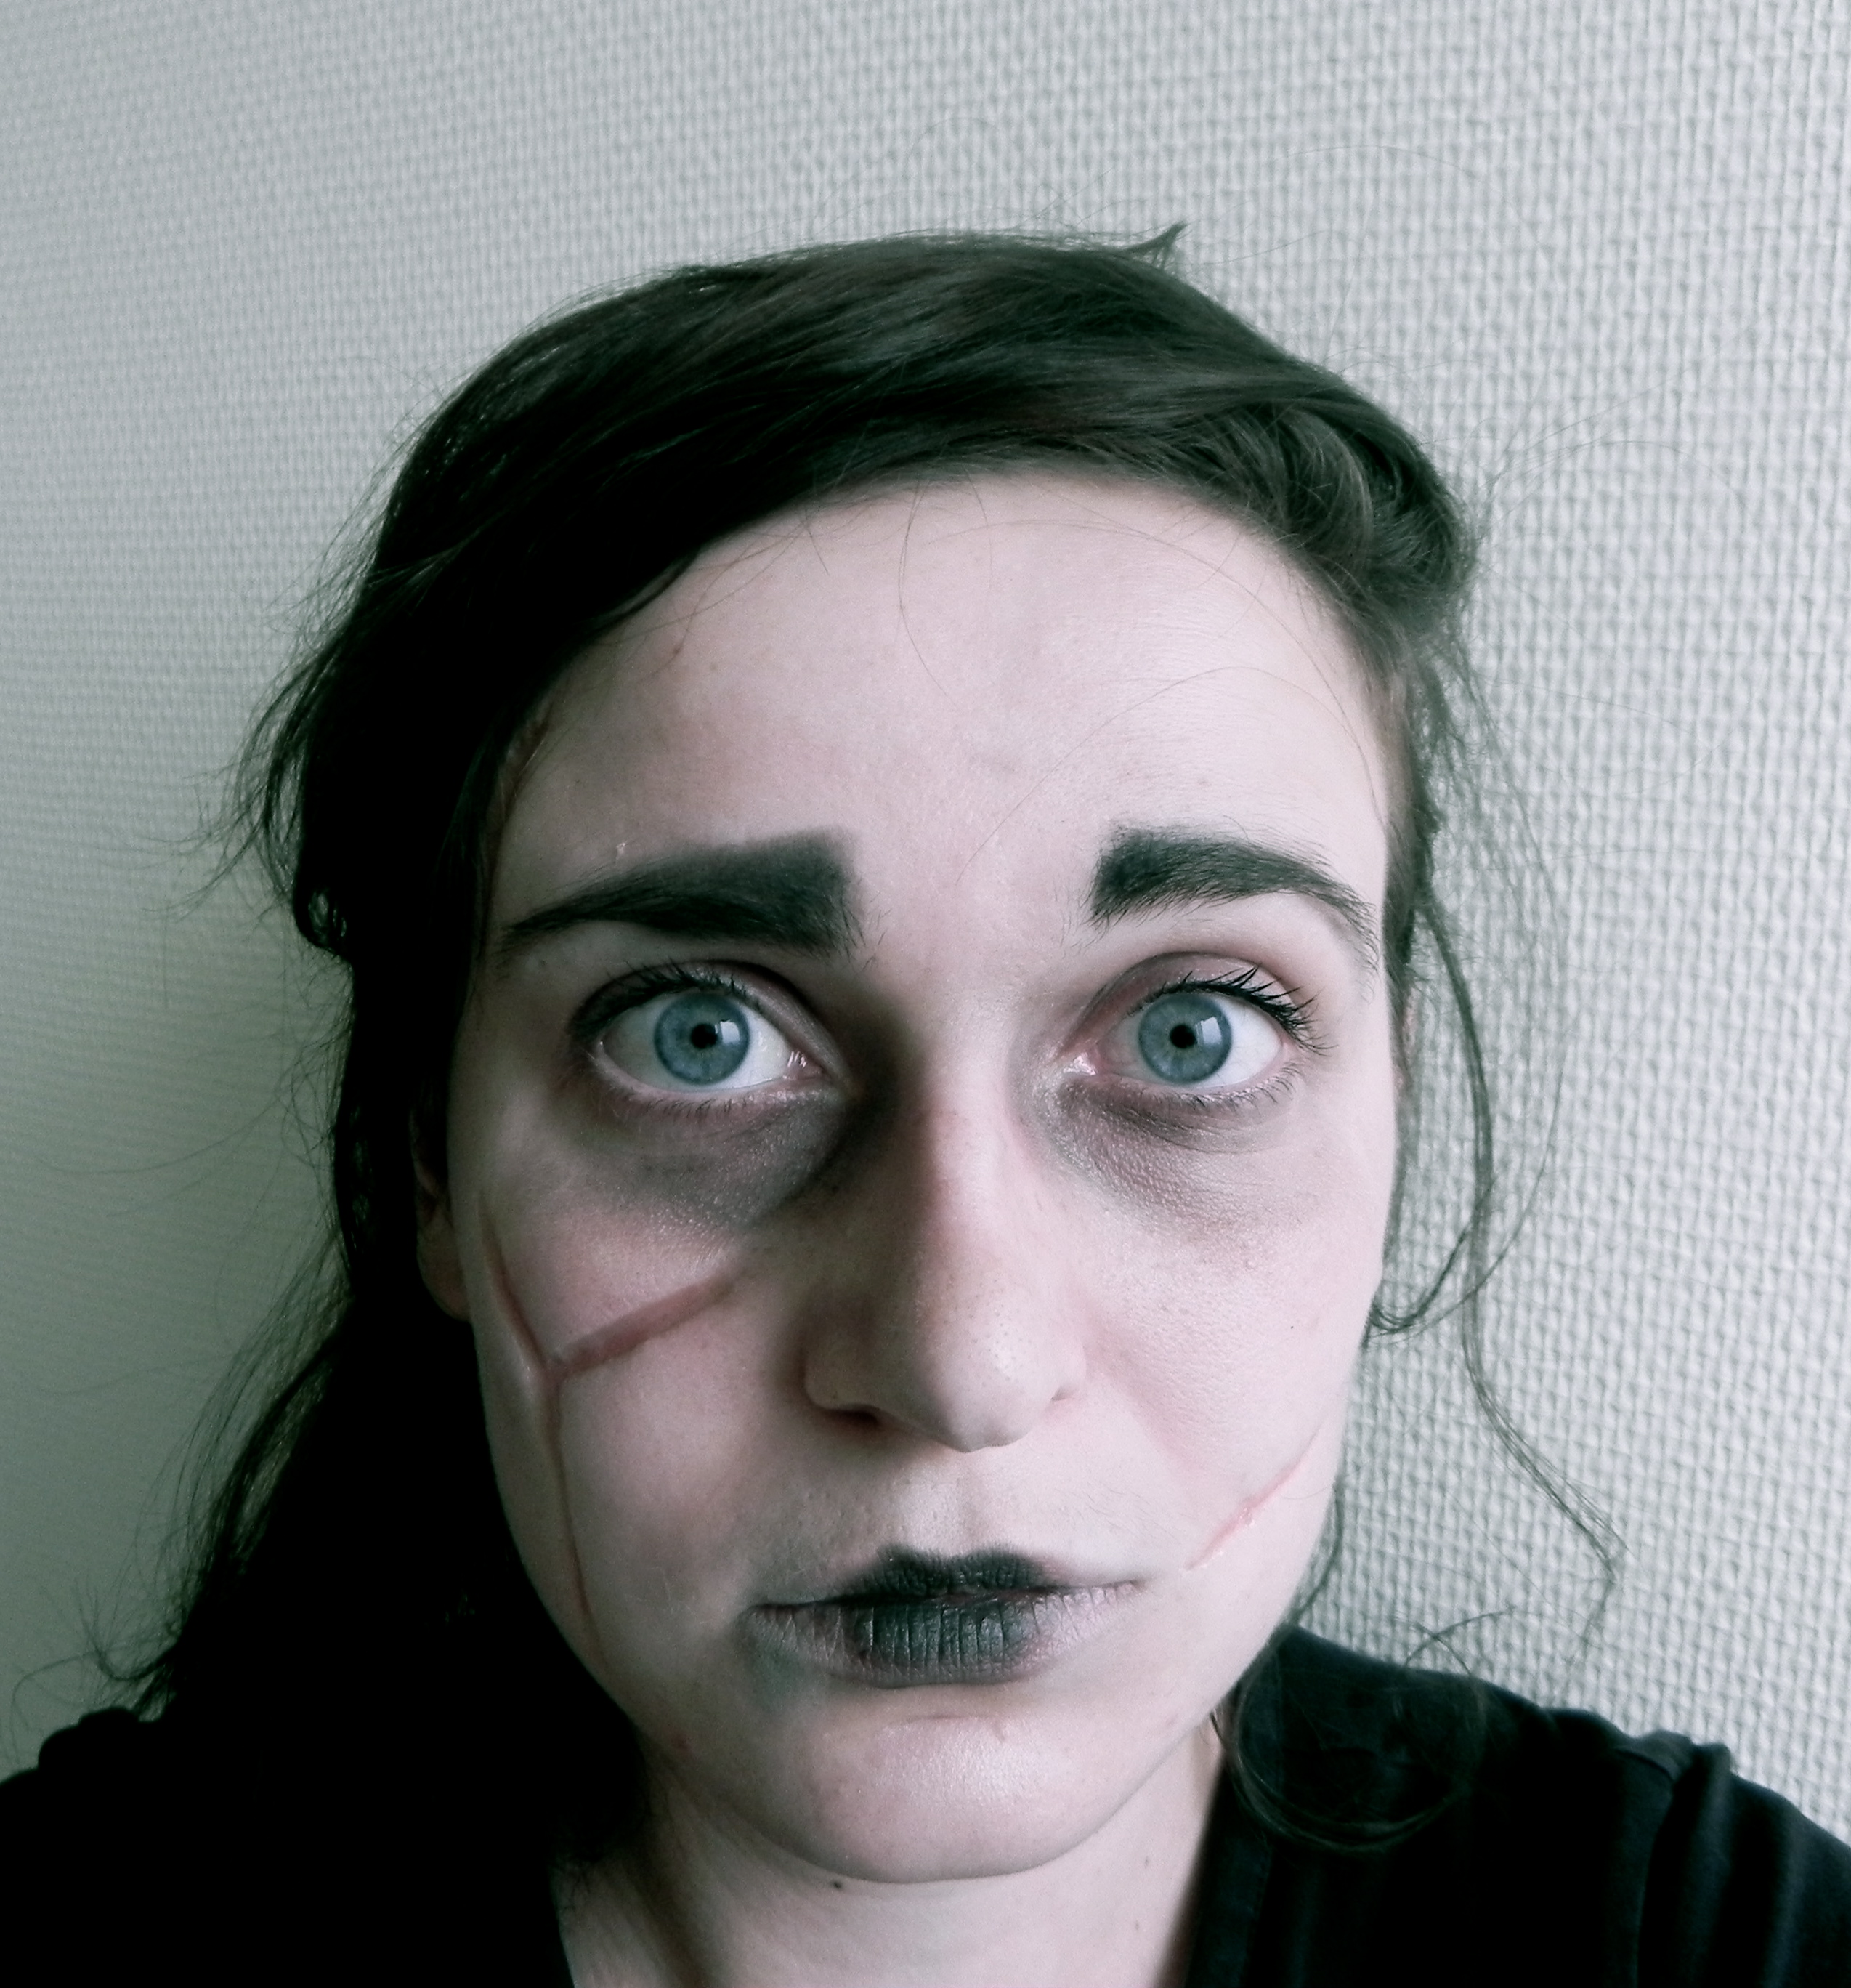 Maquillage halloween avec du collodion tutoriel vid o d butante en couture - Maquillage halloween cicatrice ...